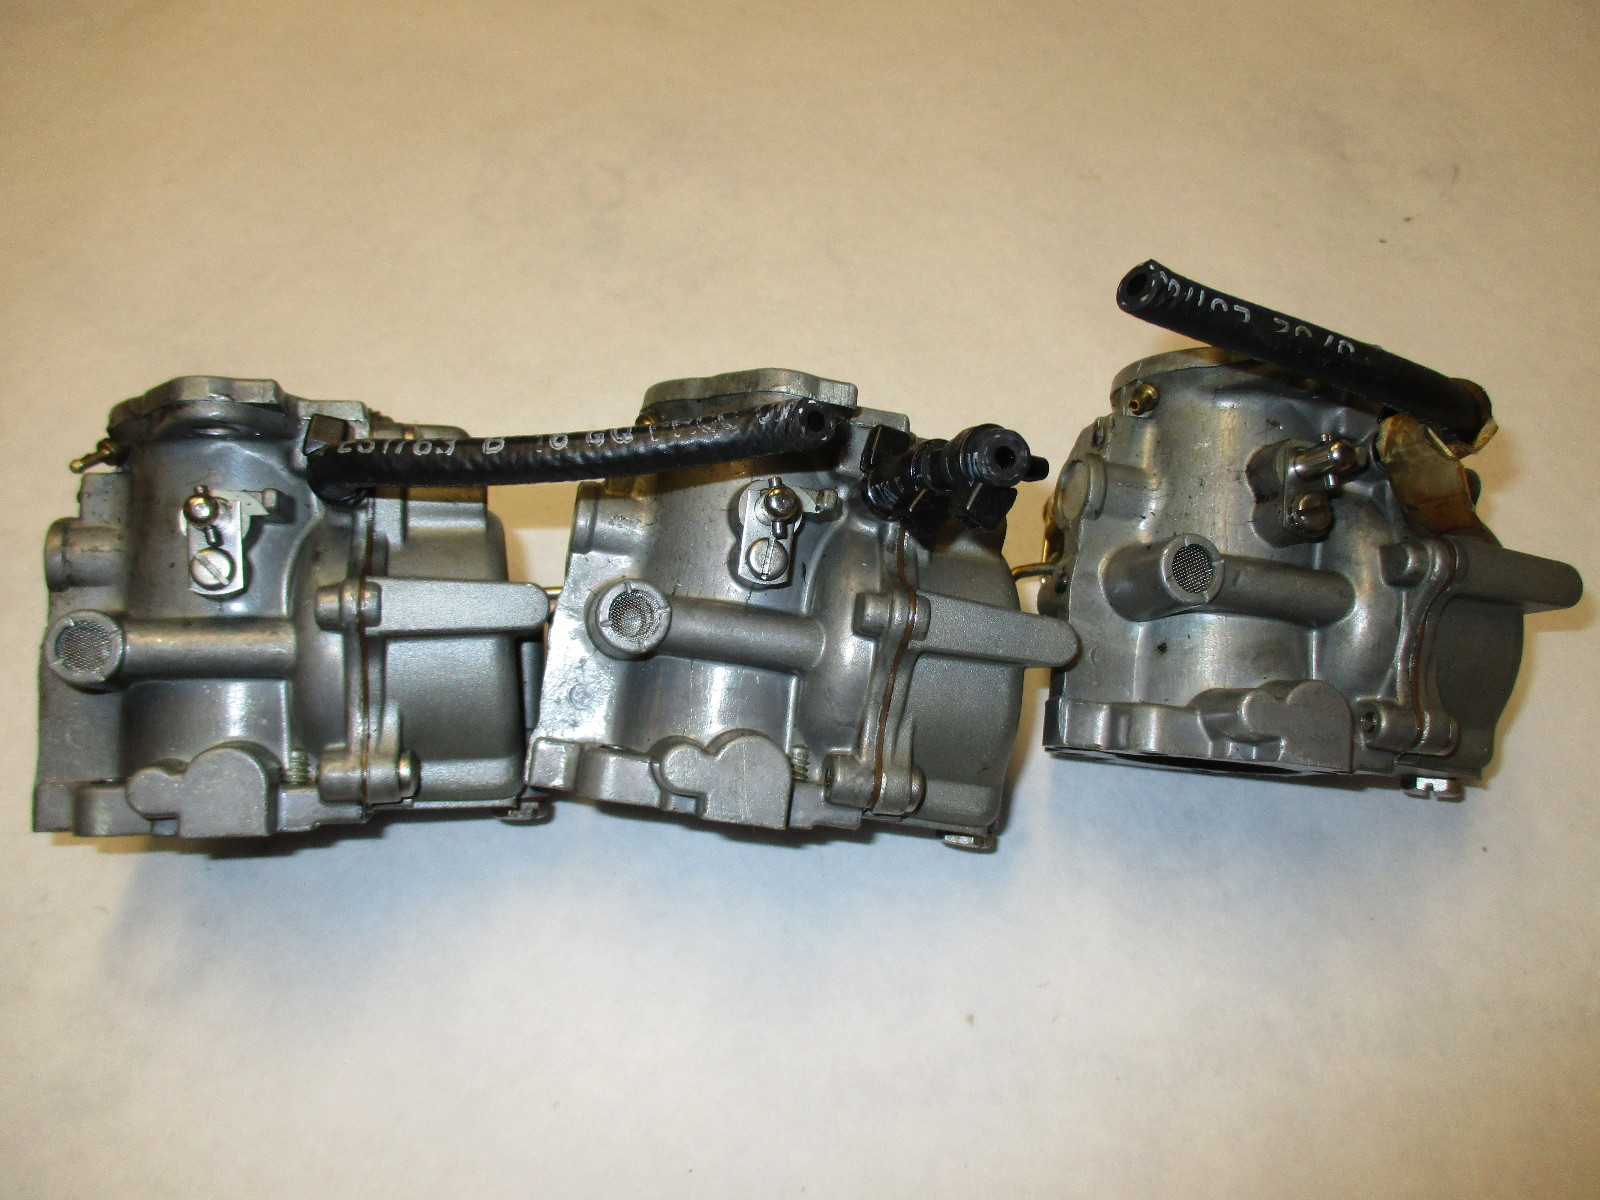 0433237 0436664 Carburetor Assembly Johnson Evinrude 60 Hp